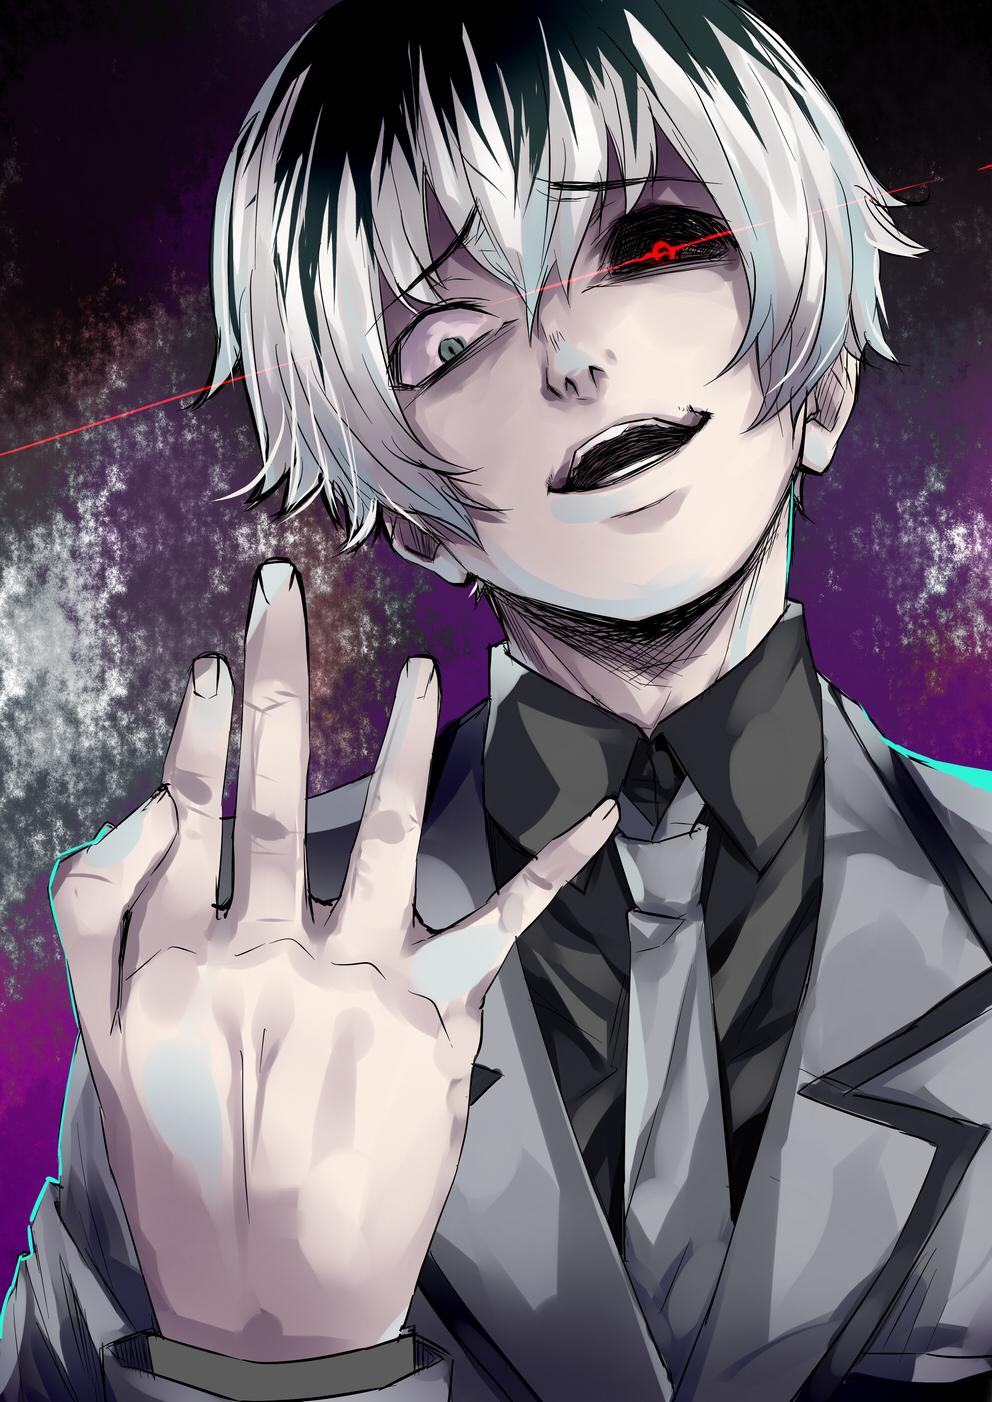 Sasaki Haise Tokyo Ghoulre Zerochan Anime Image Board